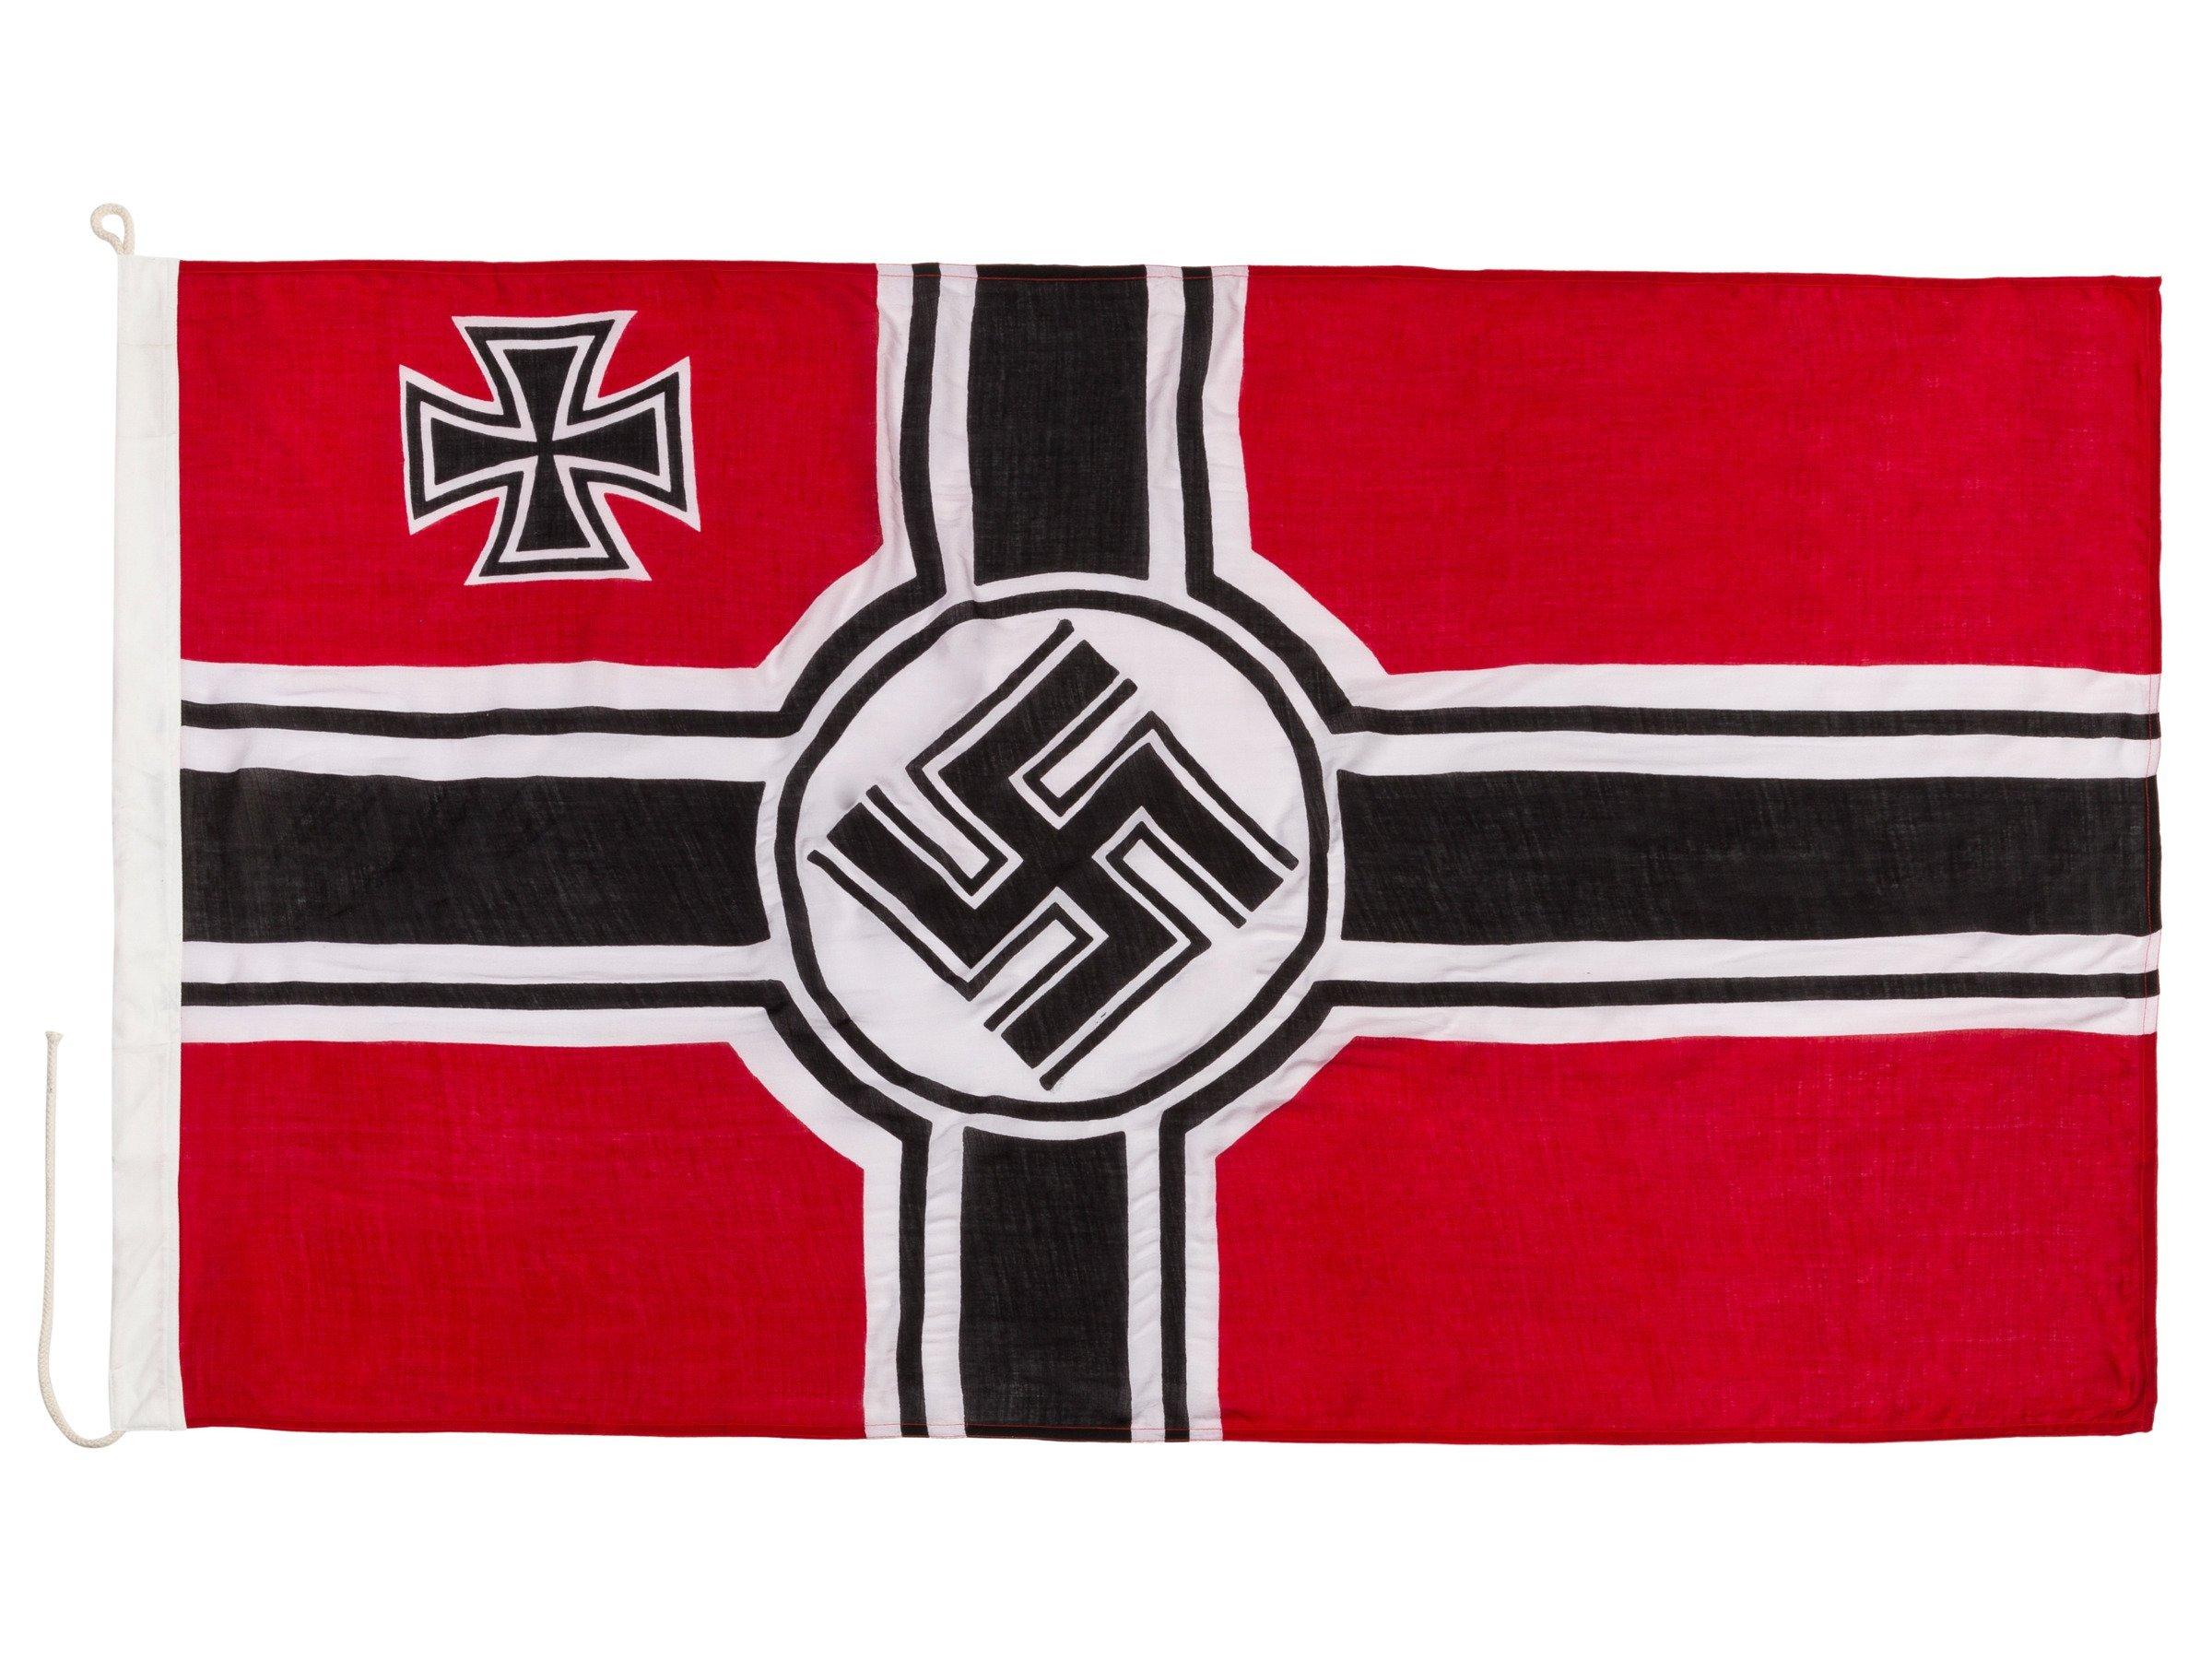 Reichskriegsflagge - WW2 German war flag - big - repro  Second grade